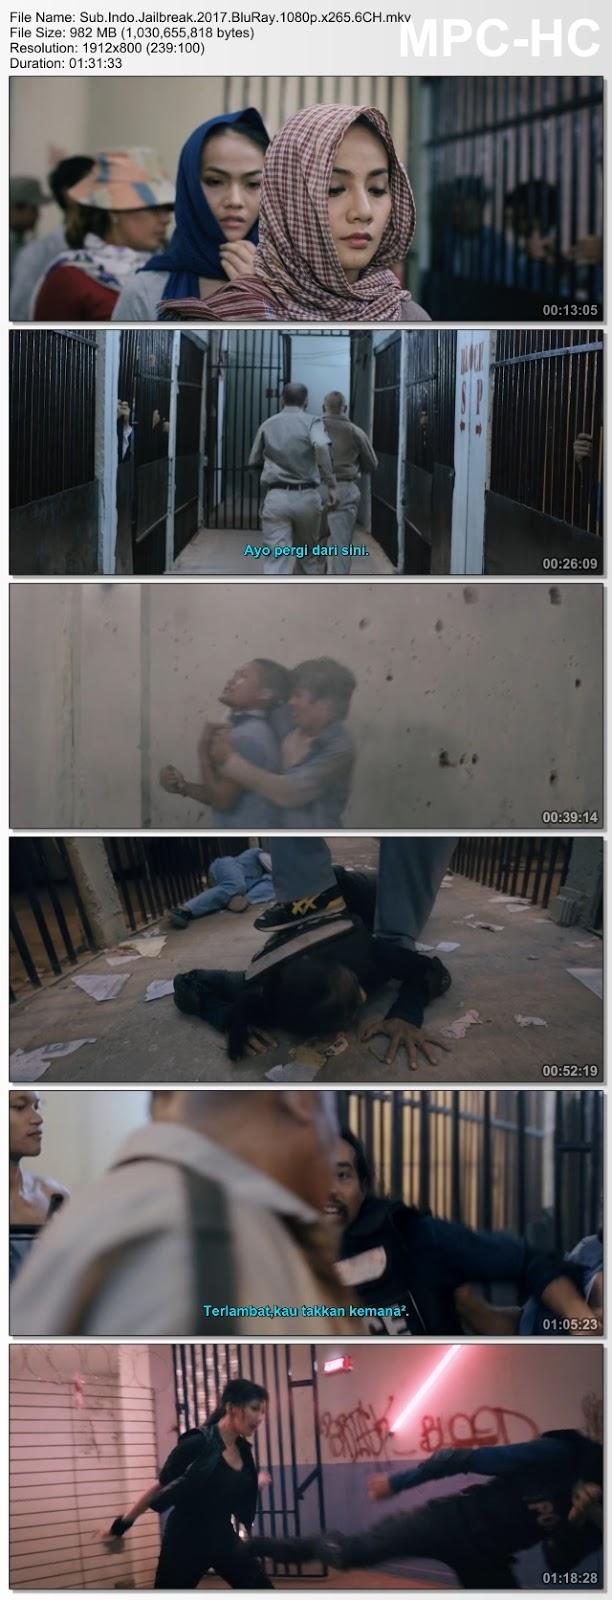 Screenshots Download Film Gratis ការពារឧក្រិដ្ឋជន aka затвор за почивка aka шоронгийн завсарлага (2017) BluRay 480p MP4 Subtitle Bahasa Indonesia 3GP